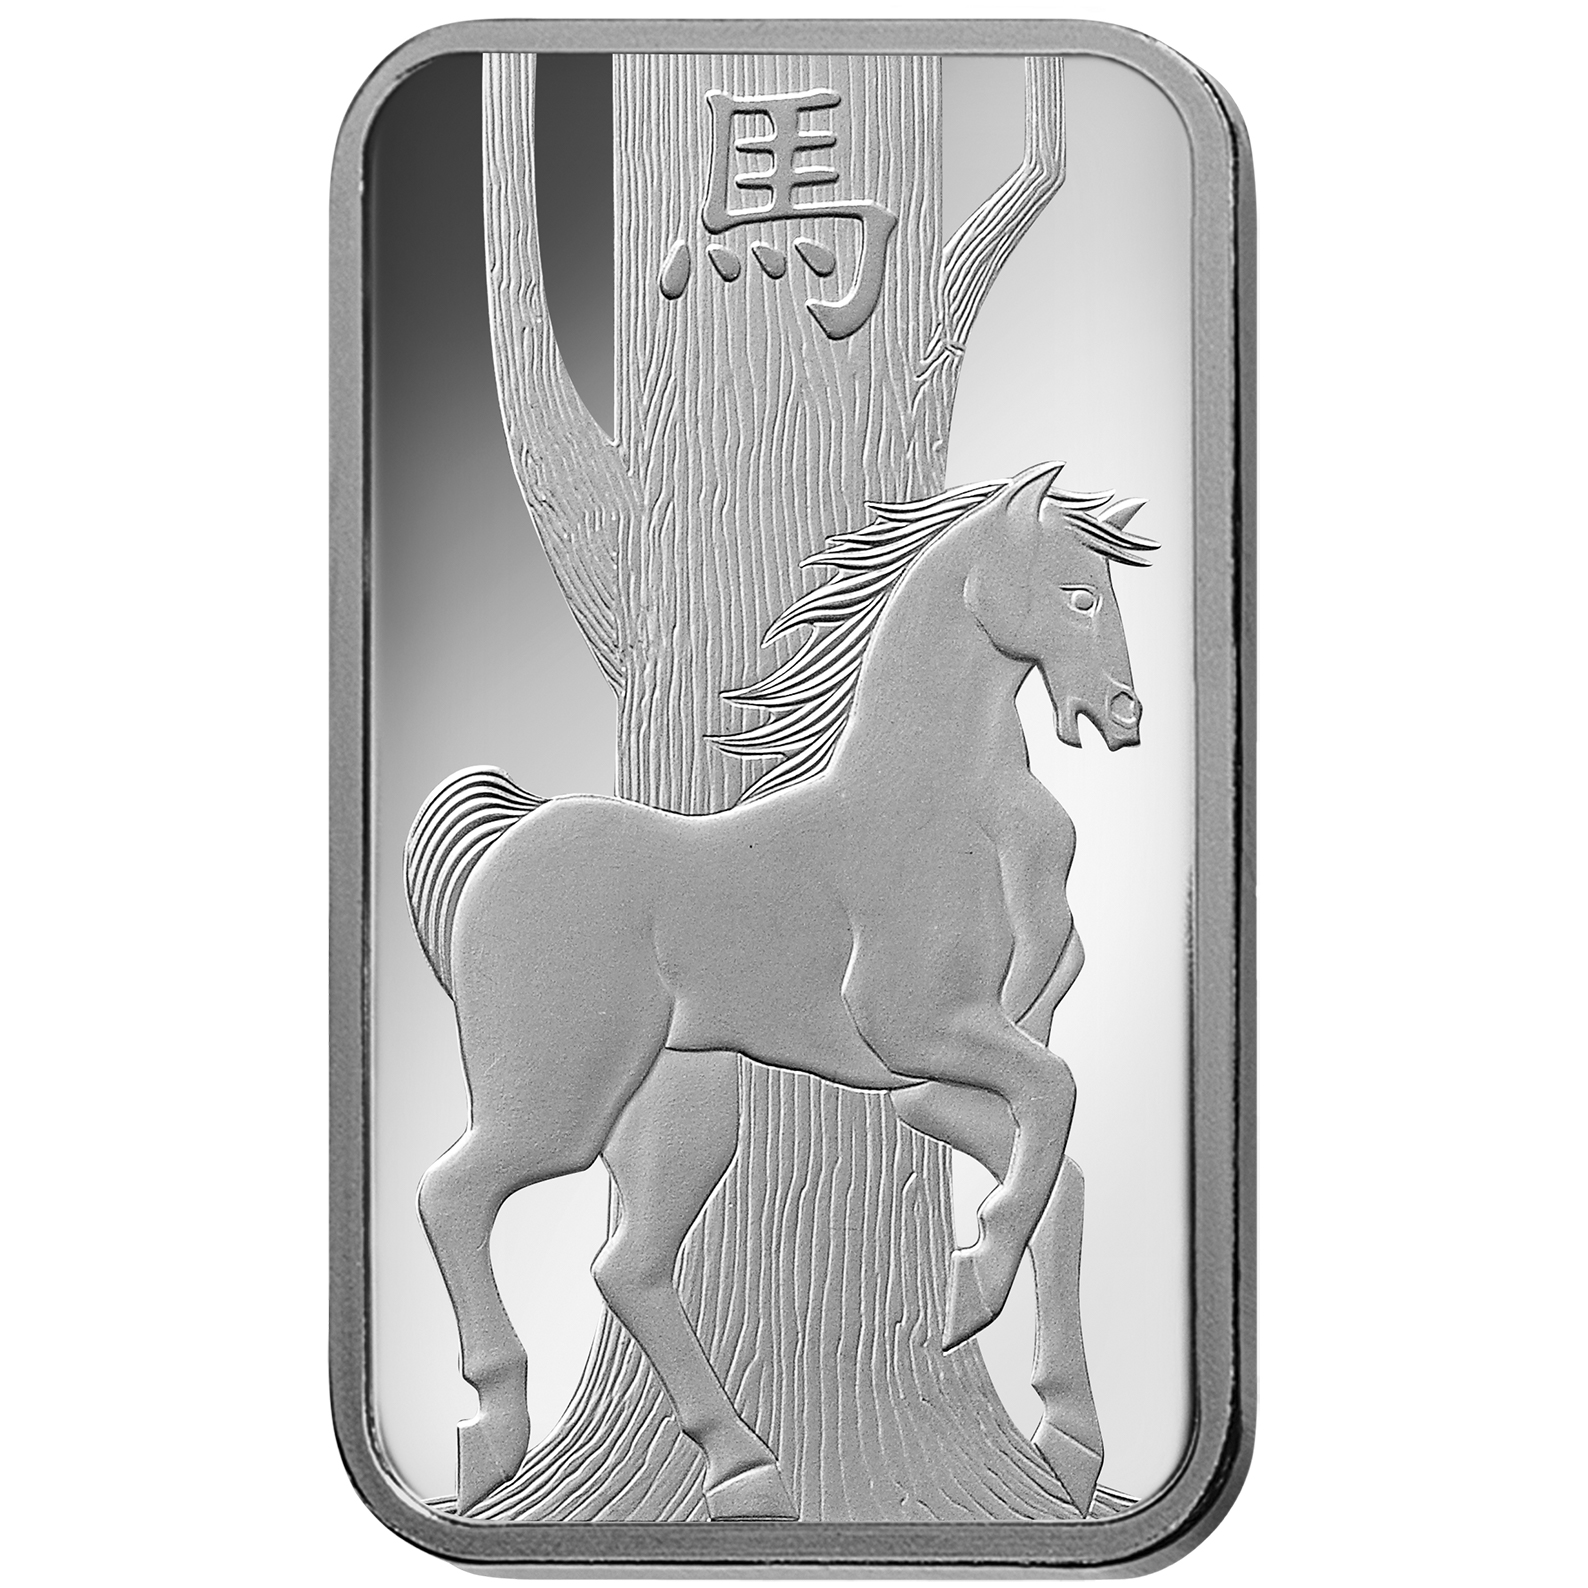 100 grammi lingottino d'argento puro 999.0 - PAMP Suisse Cavallo Lunare